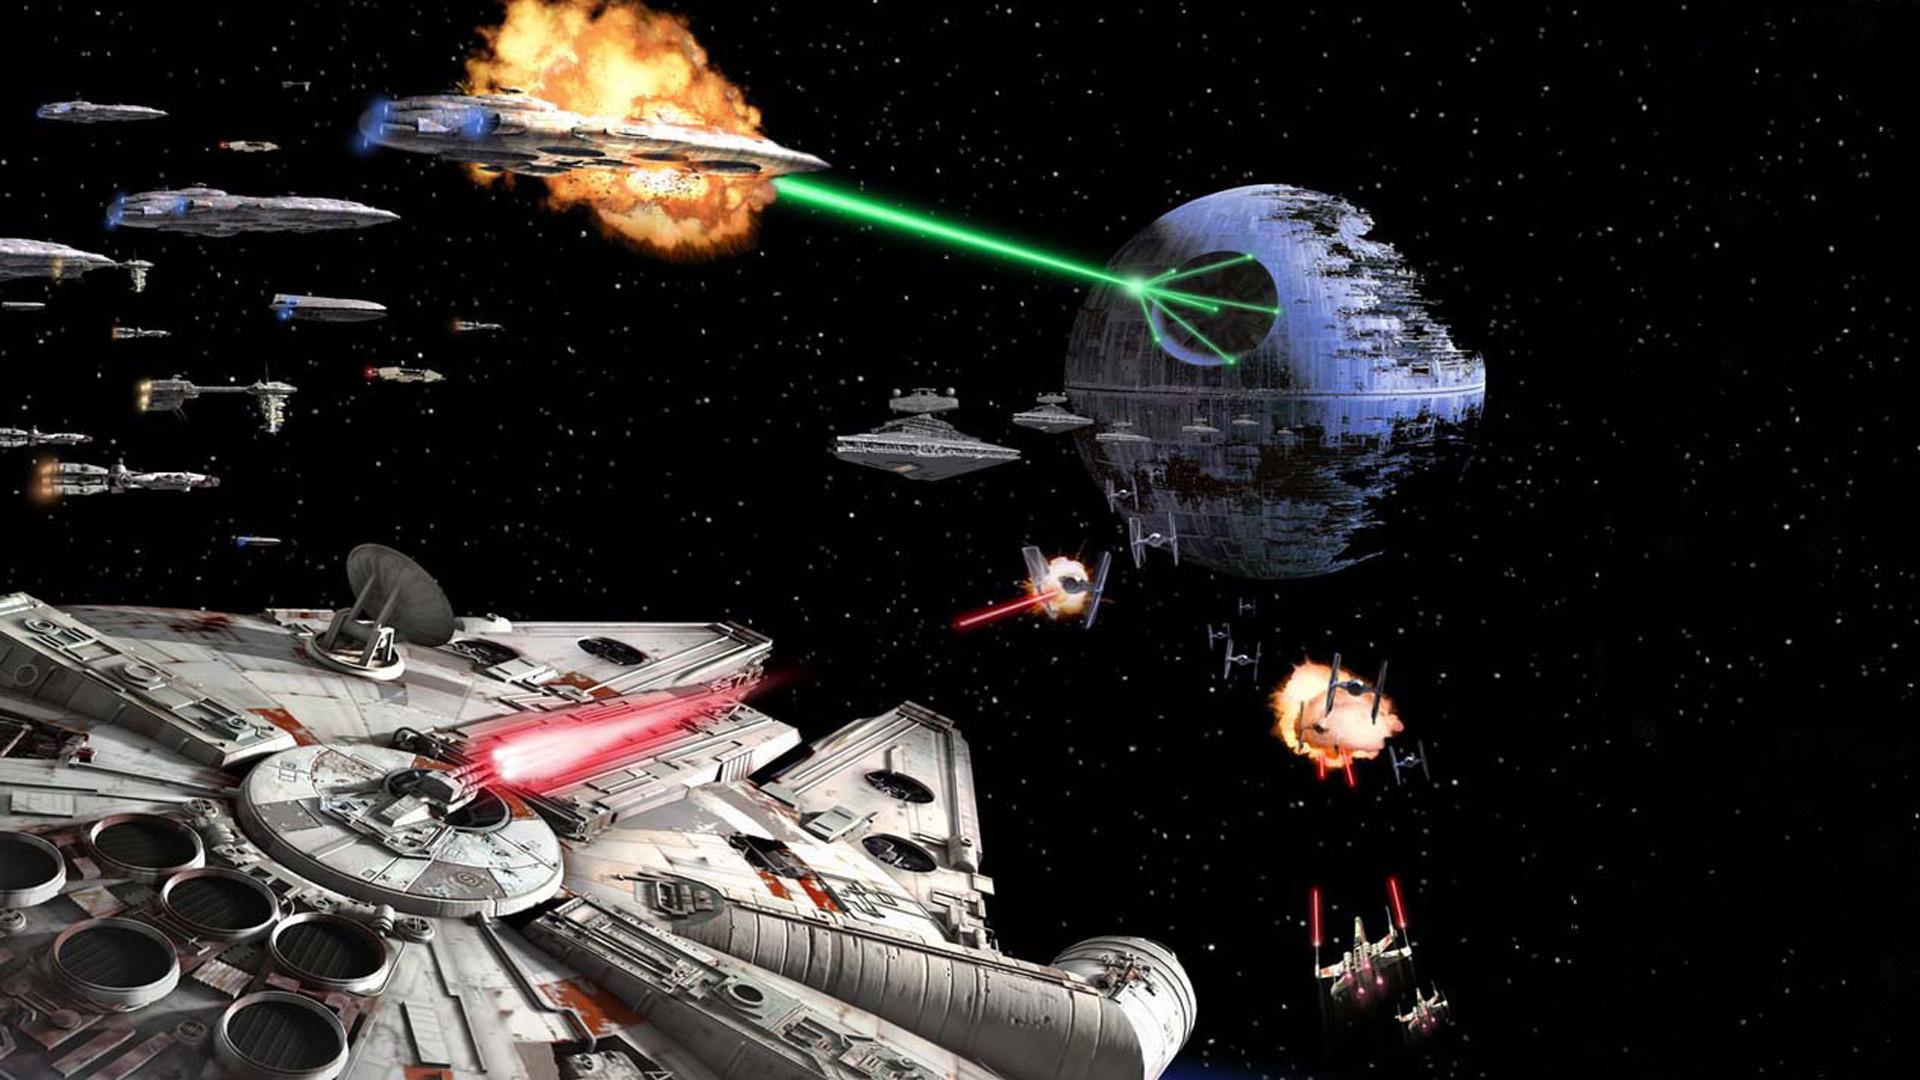 X Wing Fighter Iphone Wallpaper Free Death Star Backgrounds Download Pixelstalk Net